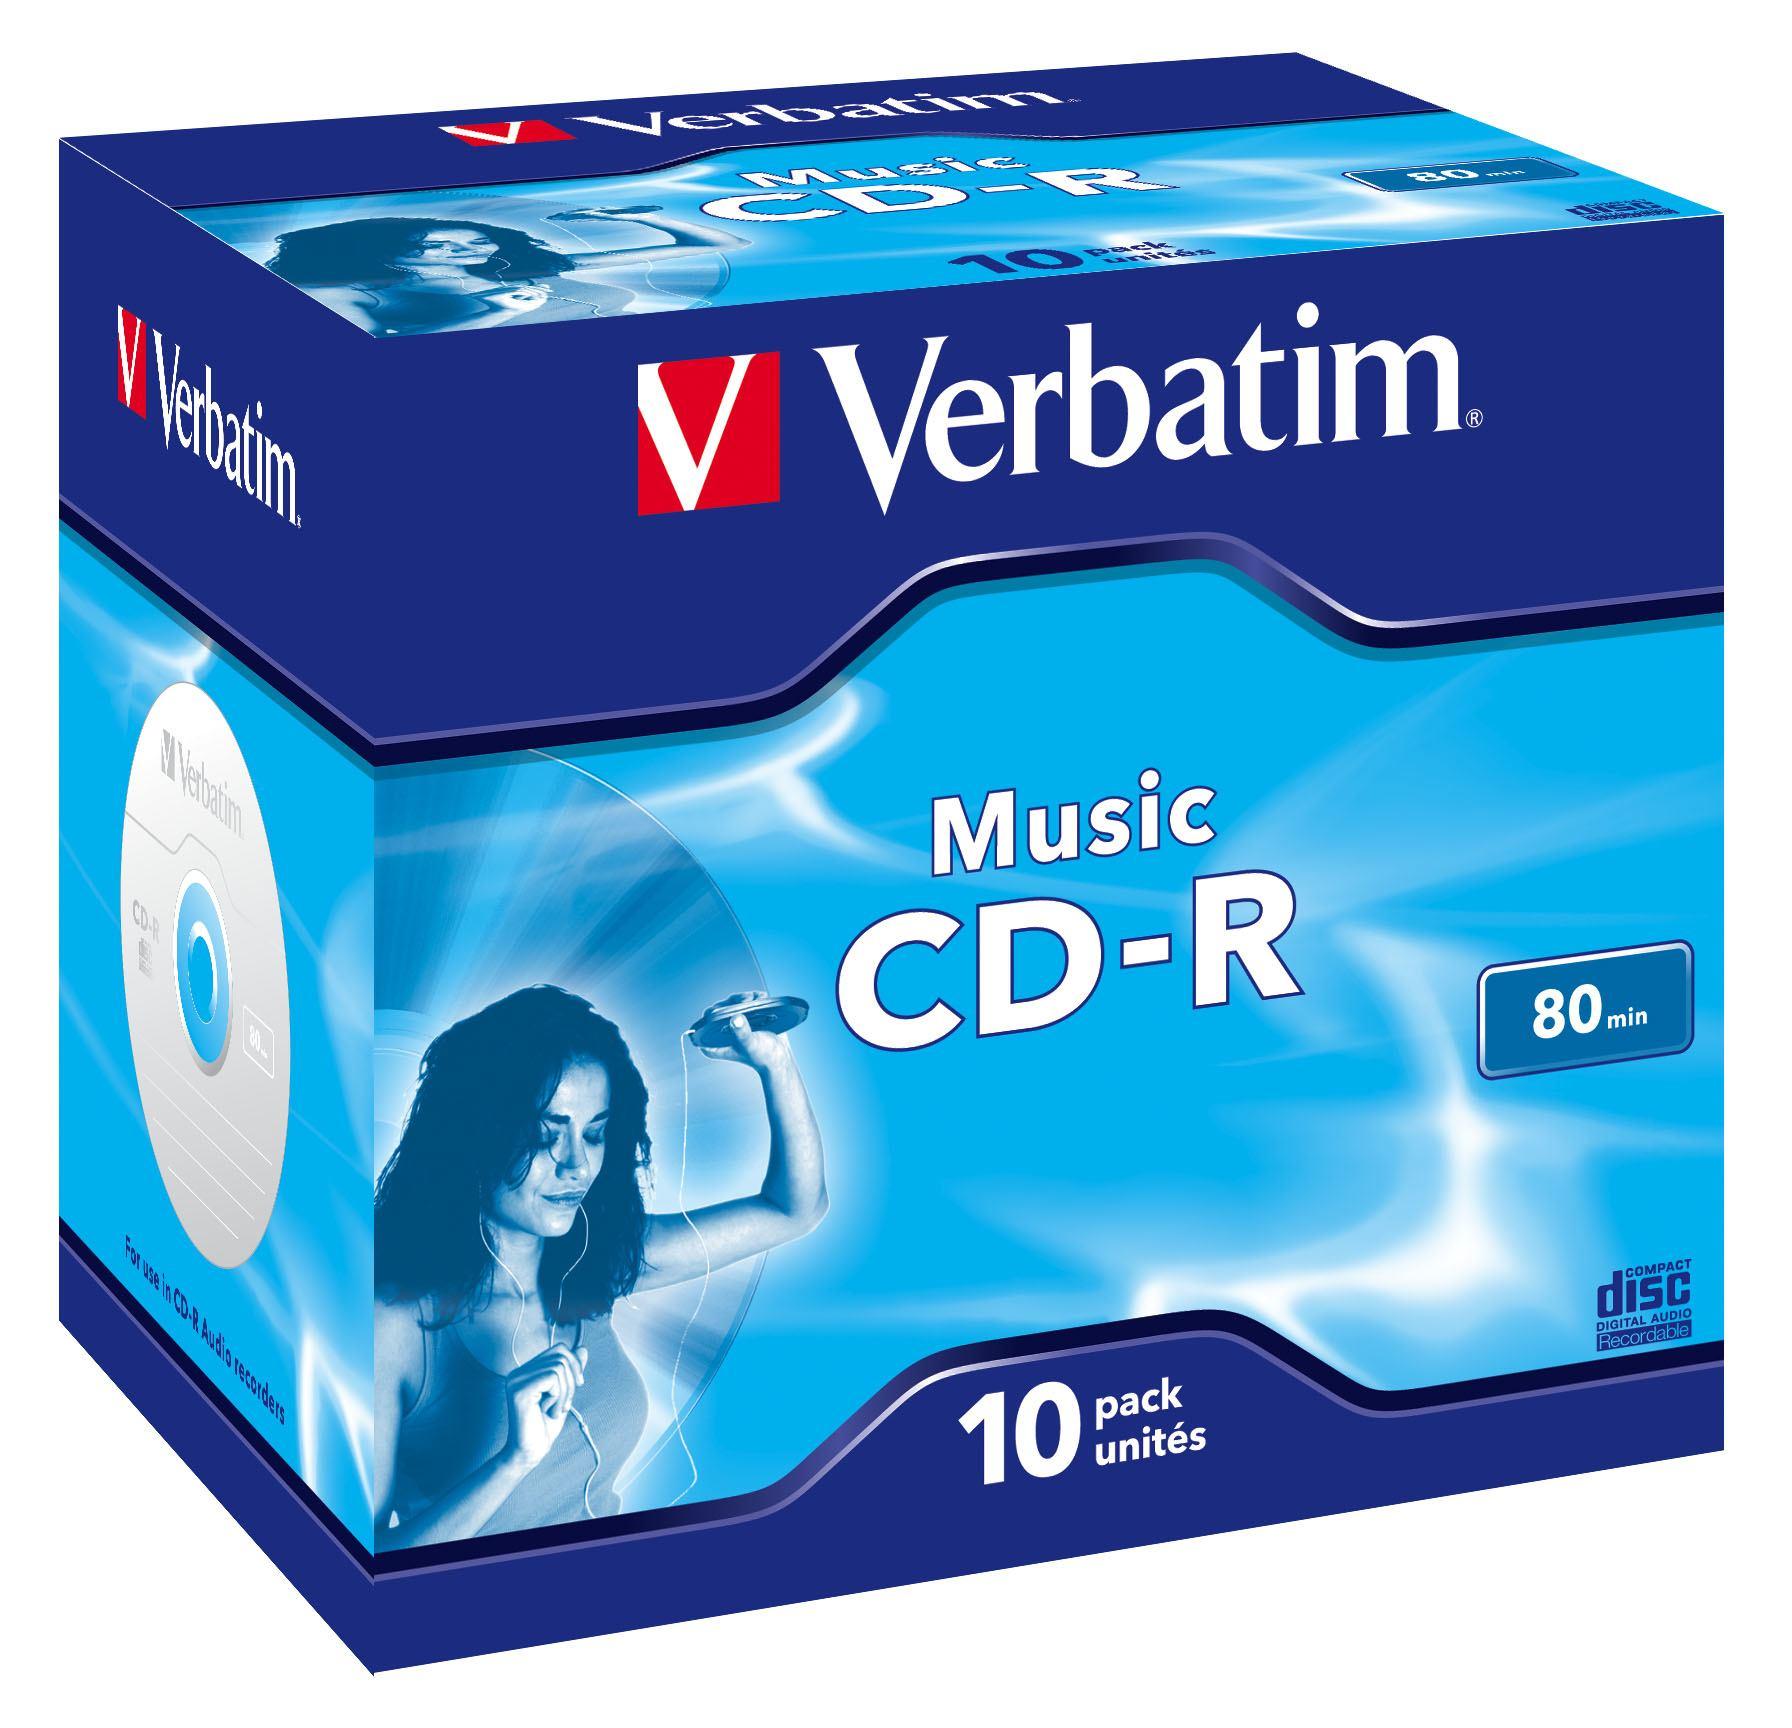 2022274-Verbatim-Music-CD-R-700-MB-10-pezzo-i-CDR-AUDIO-LIVE-IT-COLOURS-Musi